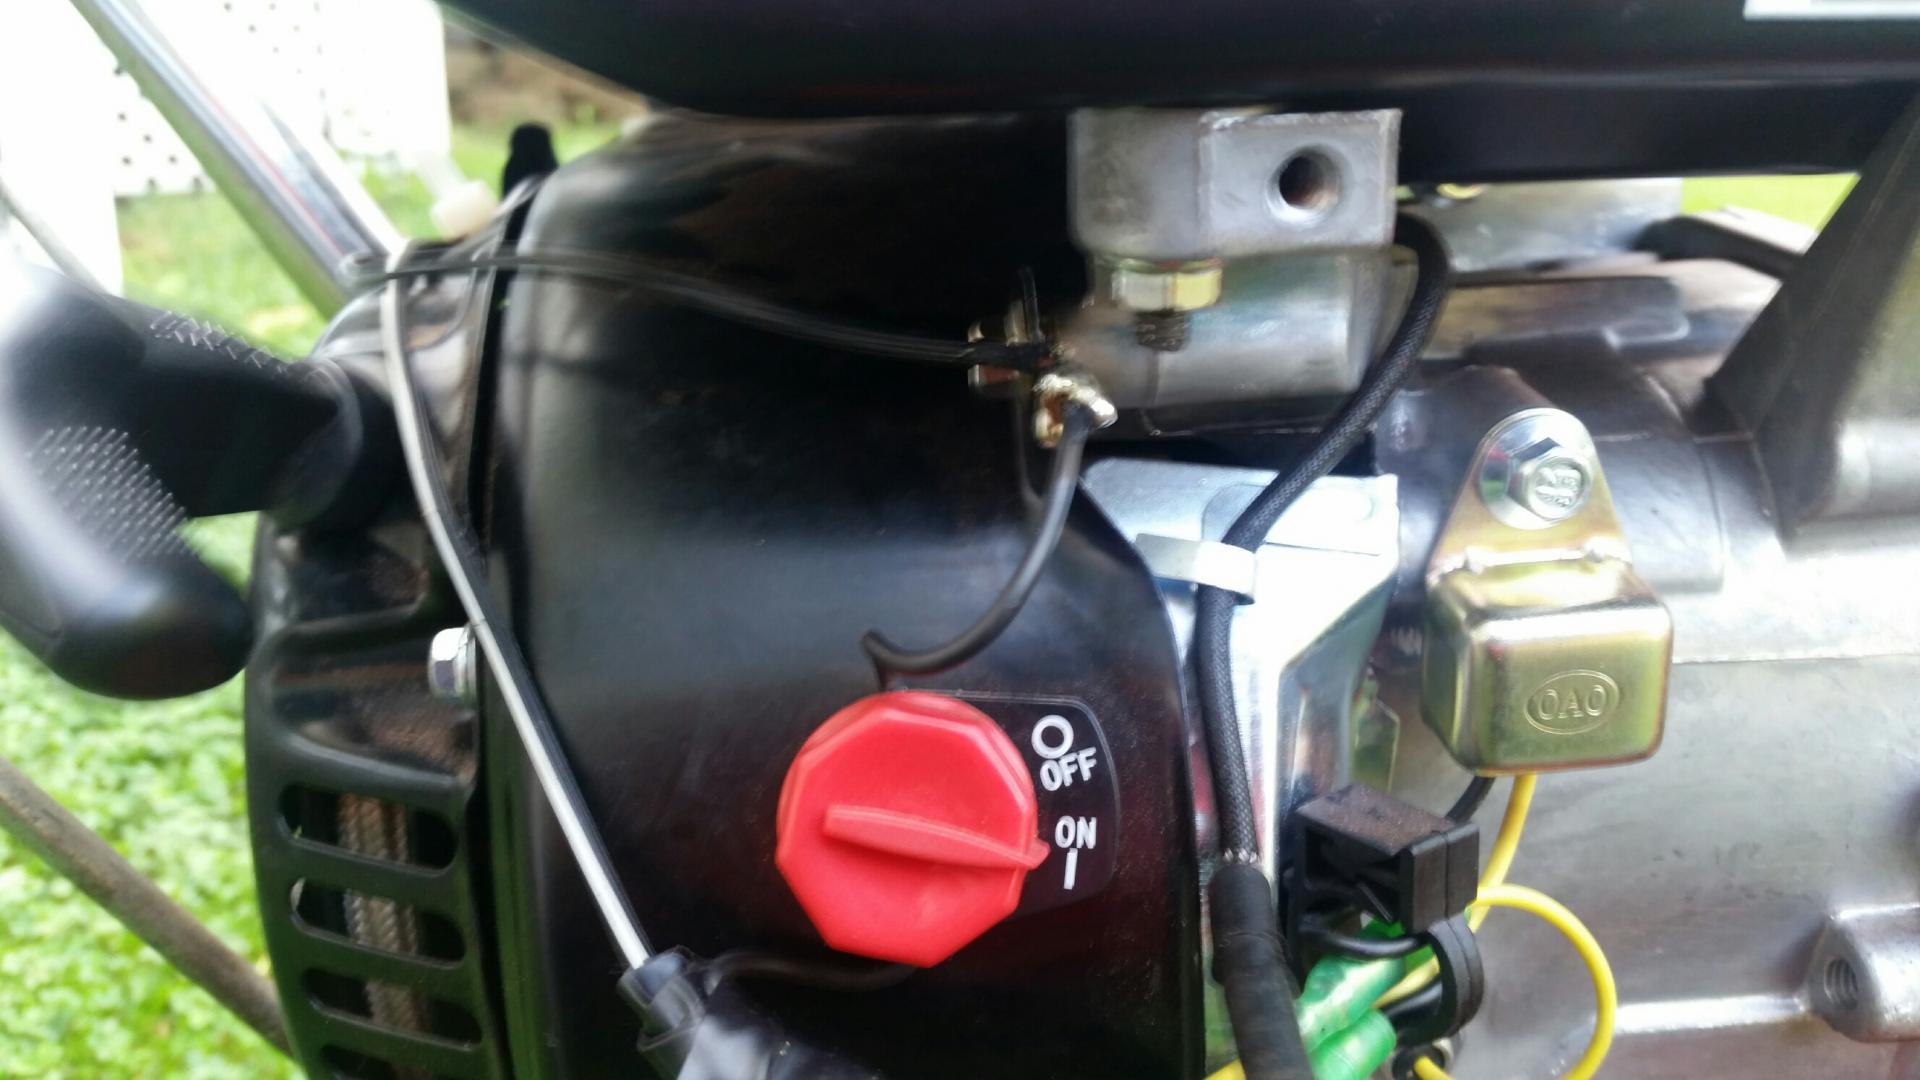 Toro 421, Predator engine swap?-20150913_163739_resized.jpg